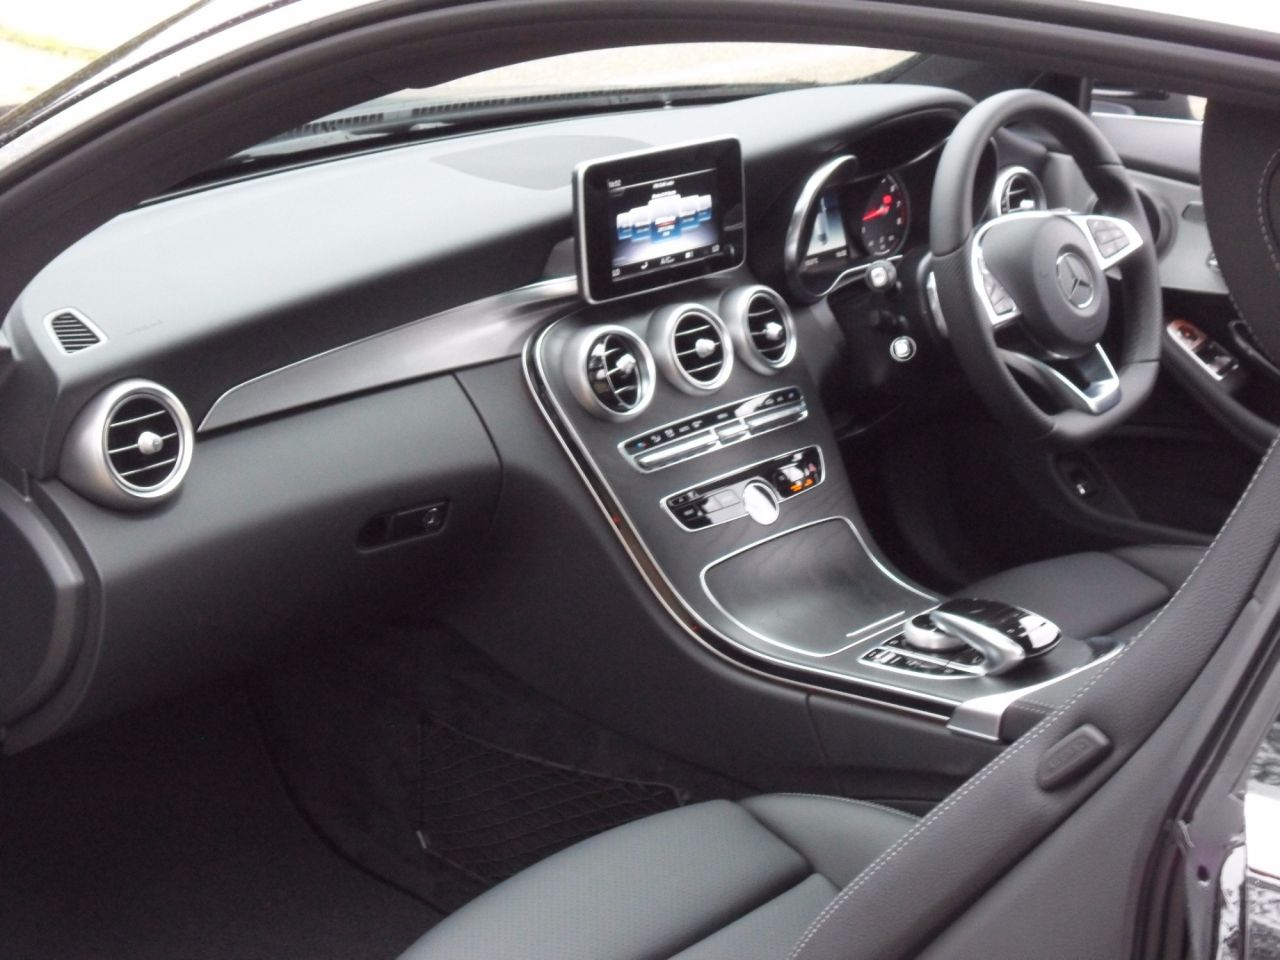 Mercedes Benz C Class Coupe Mercedes Benz C Class C200 Amg